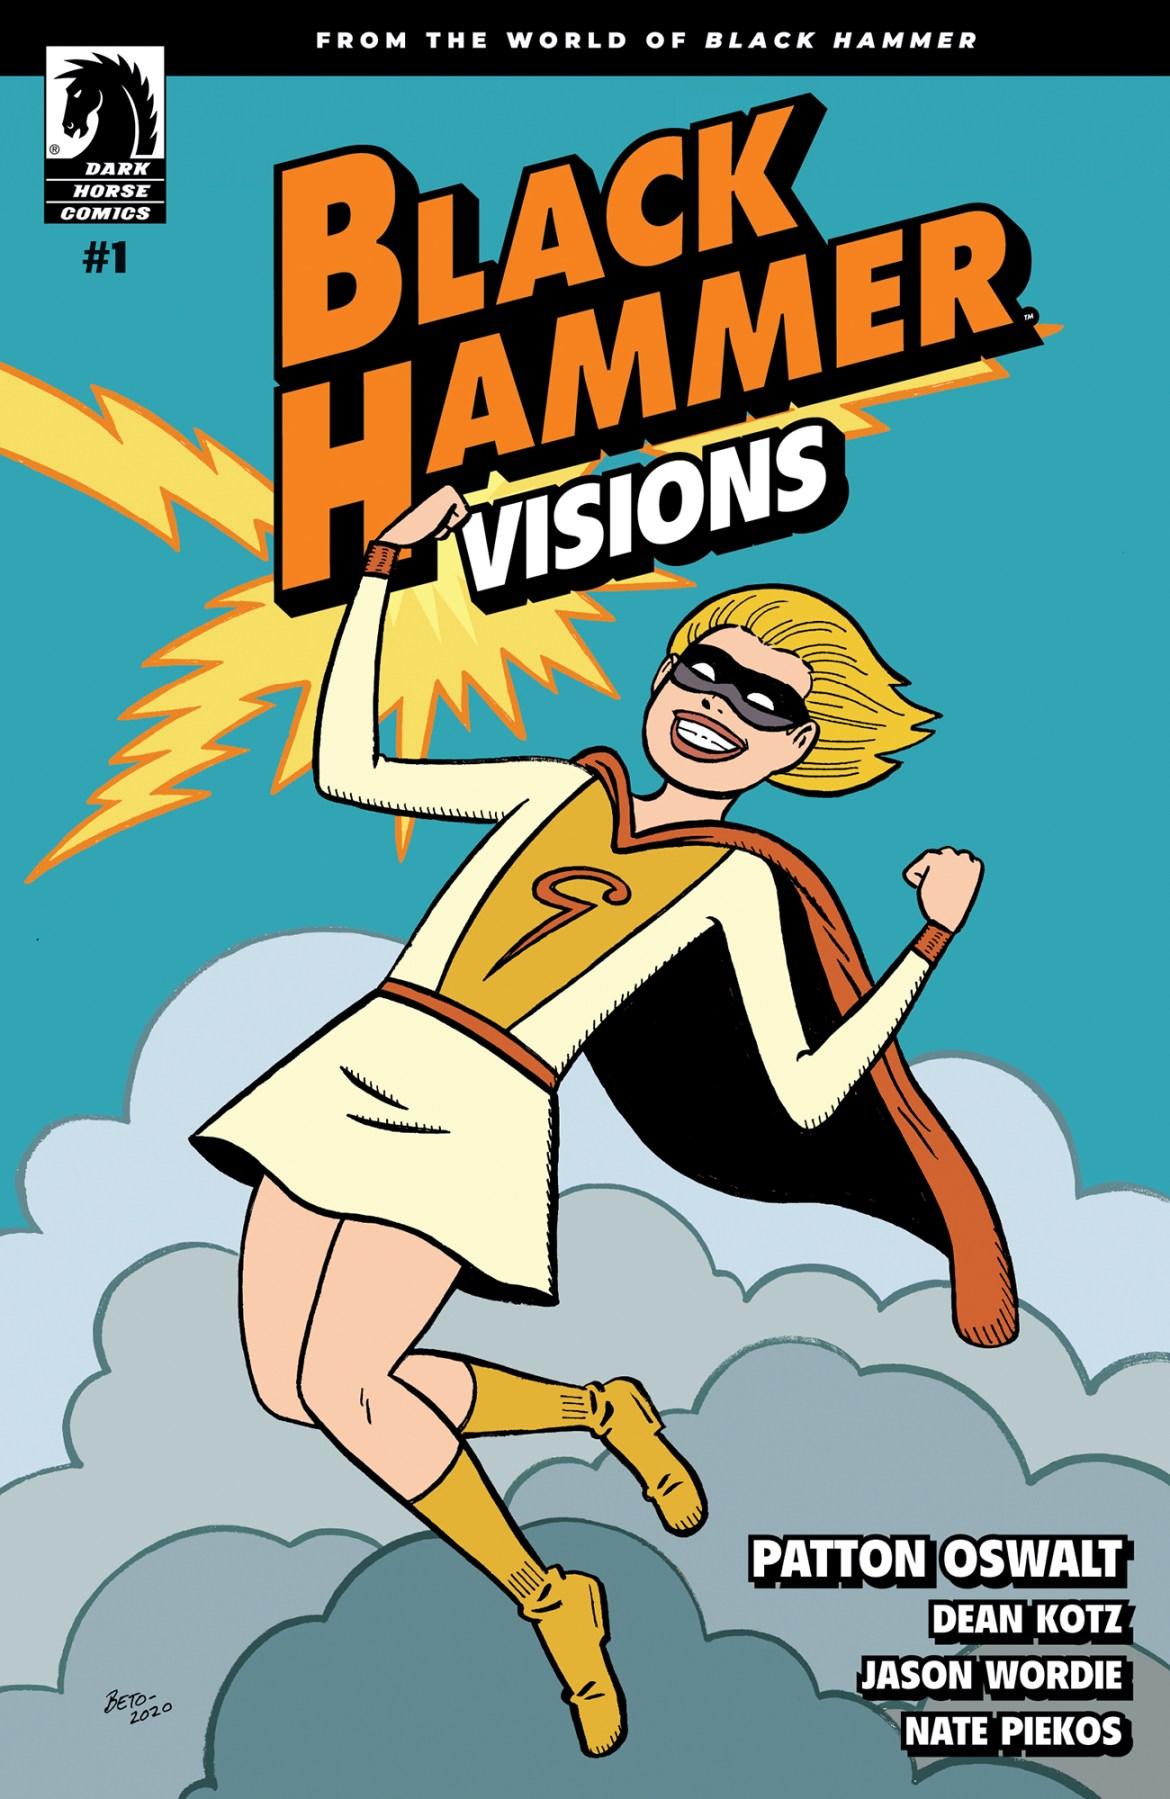 bhvisionsvarcov2 Top comic book creators converge on BLACK HAMMER: VISIONS